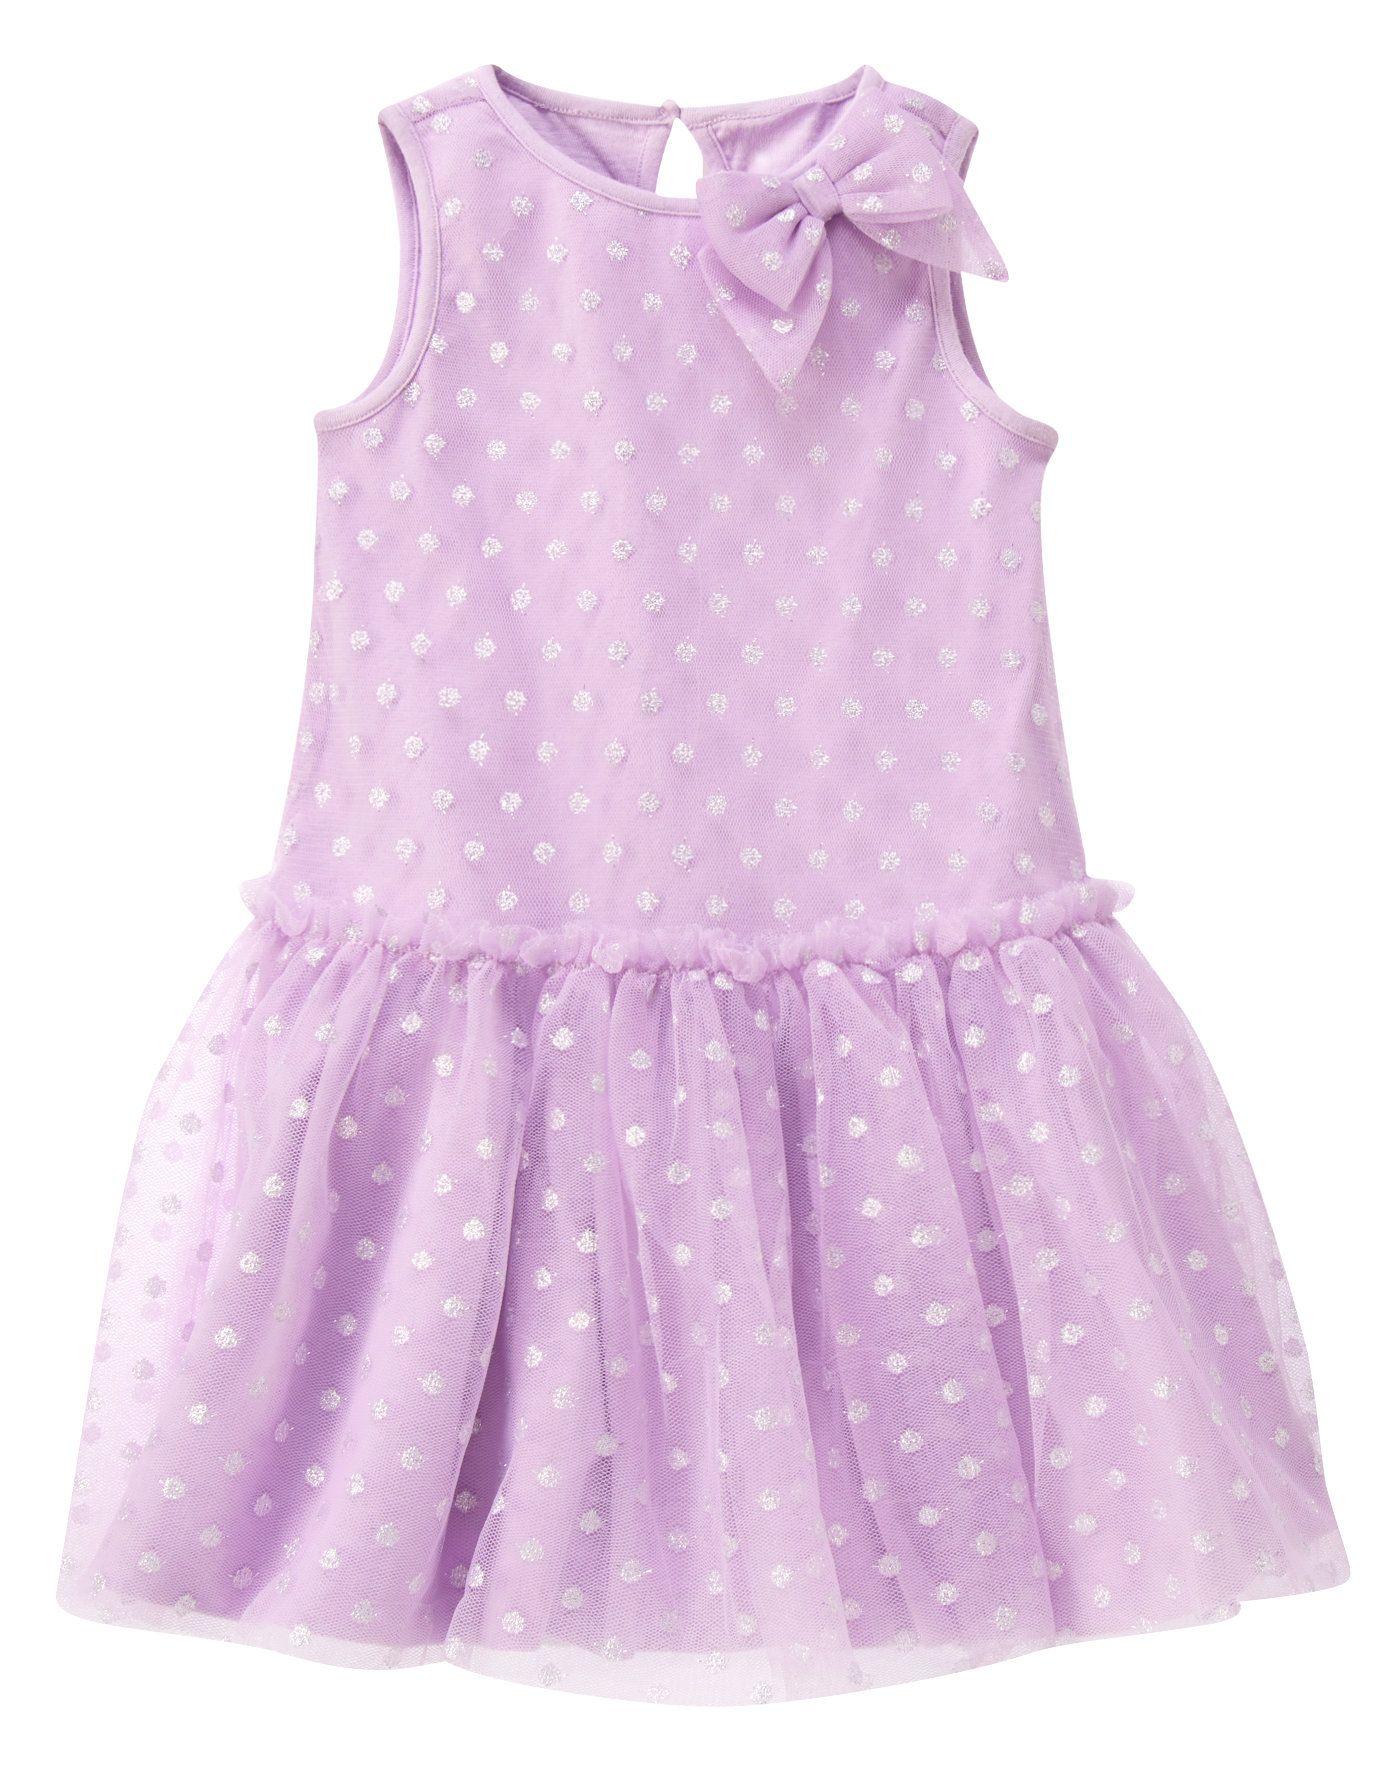 Tulle Sparkle Dot Dress at Gymboree Girl Gymboree